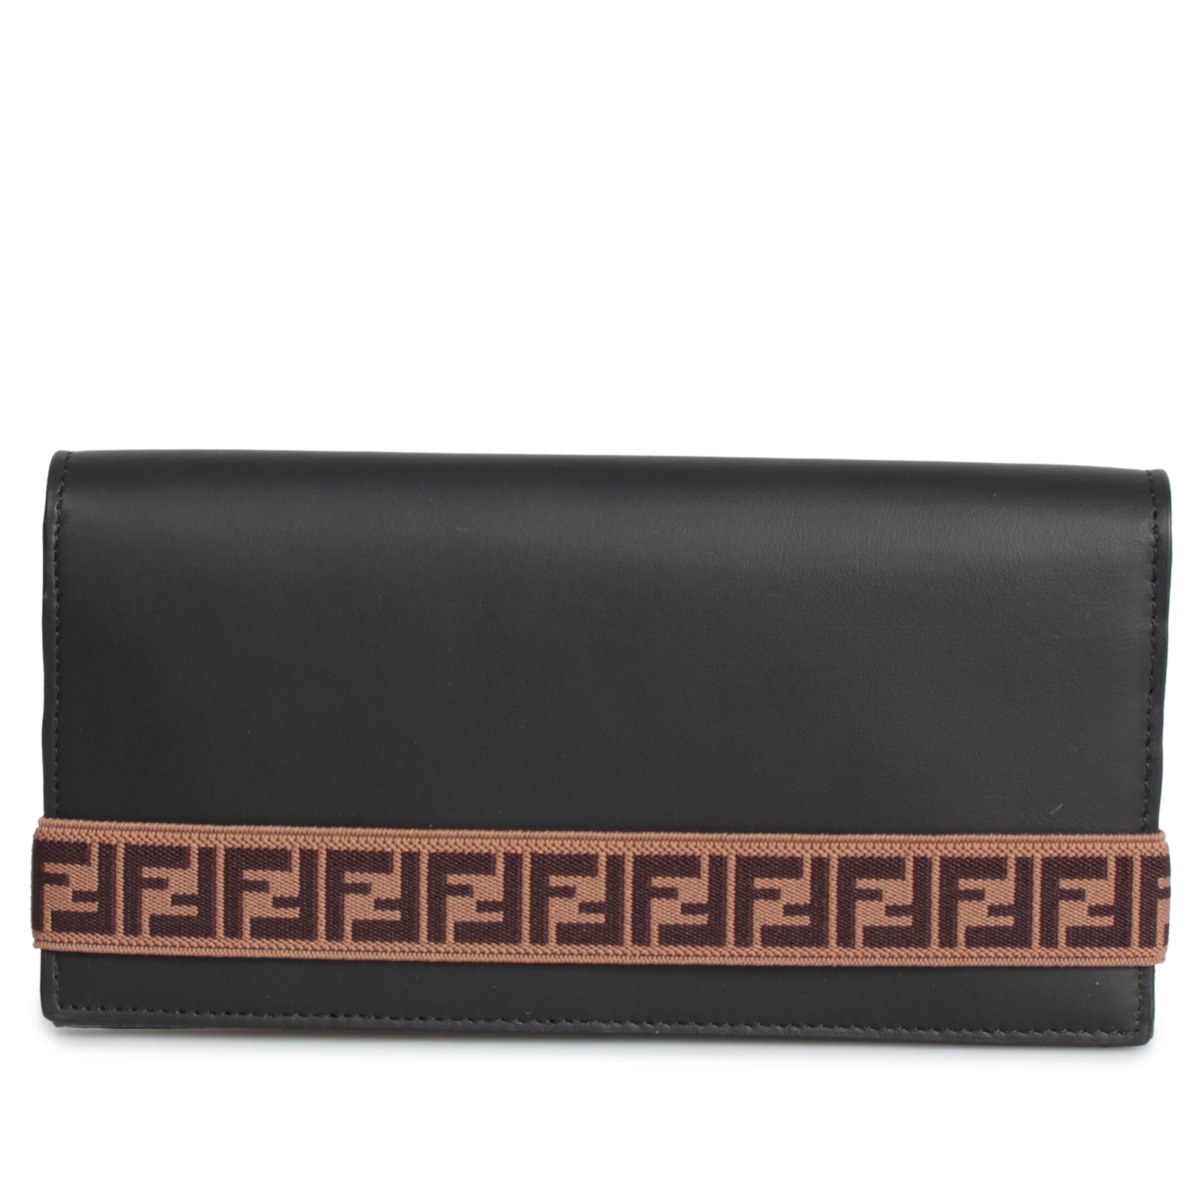 FENDI LONG WALLET フェンディ 財布 長財布 メンズ ブラック 黒 SFD0134 [12/5 新入荷]